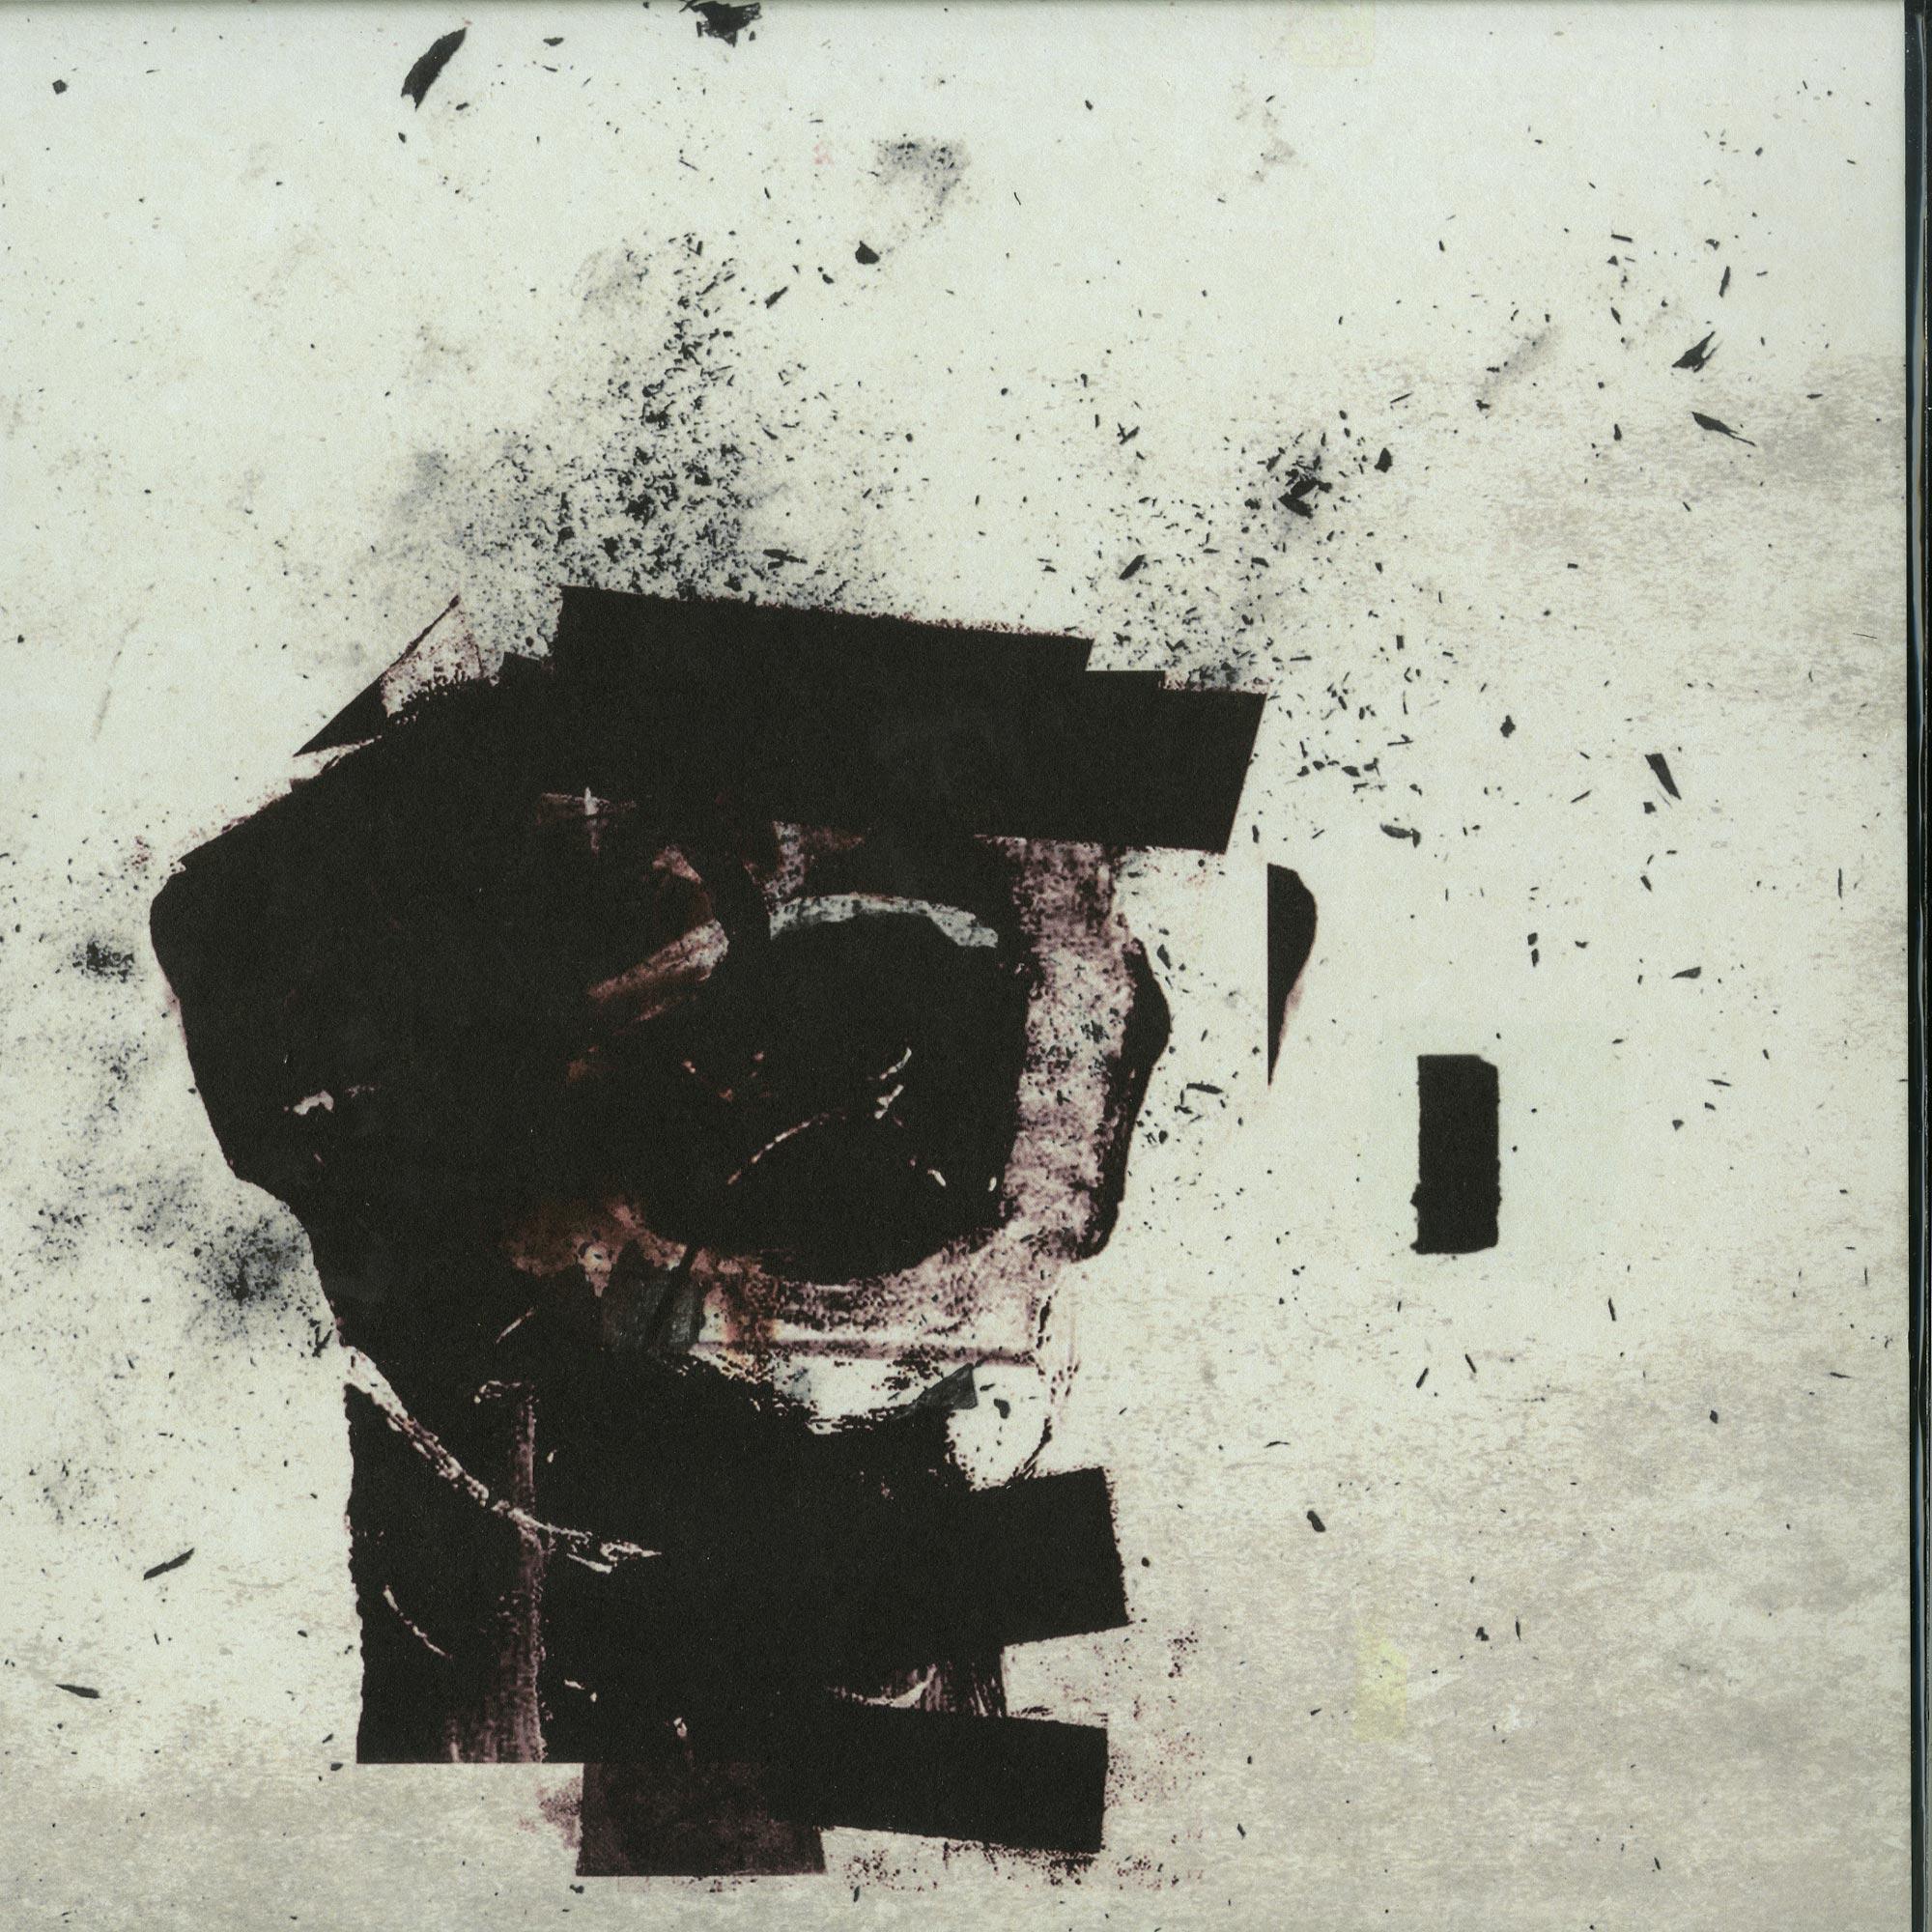 Charlotte De Witte - CLOSER EP